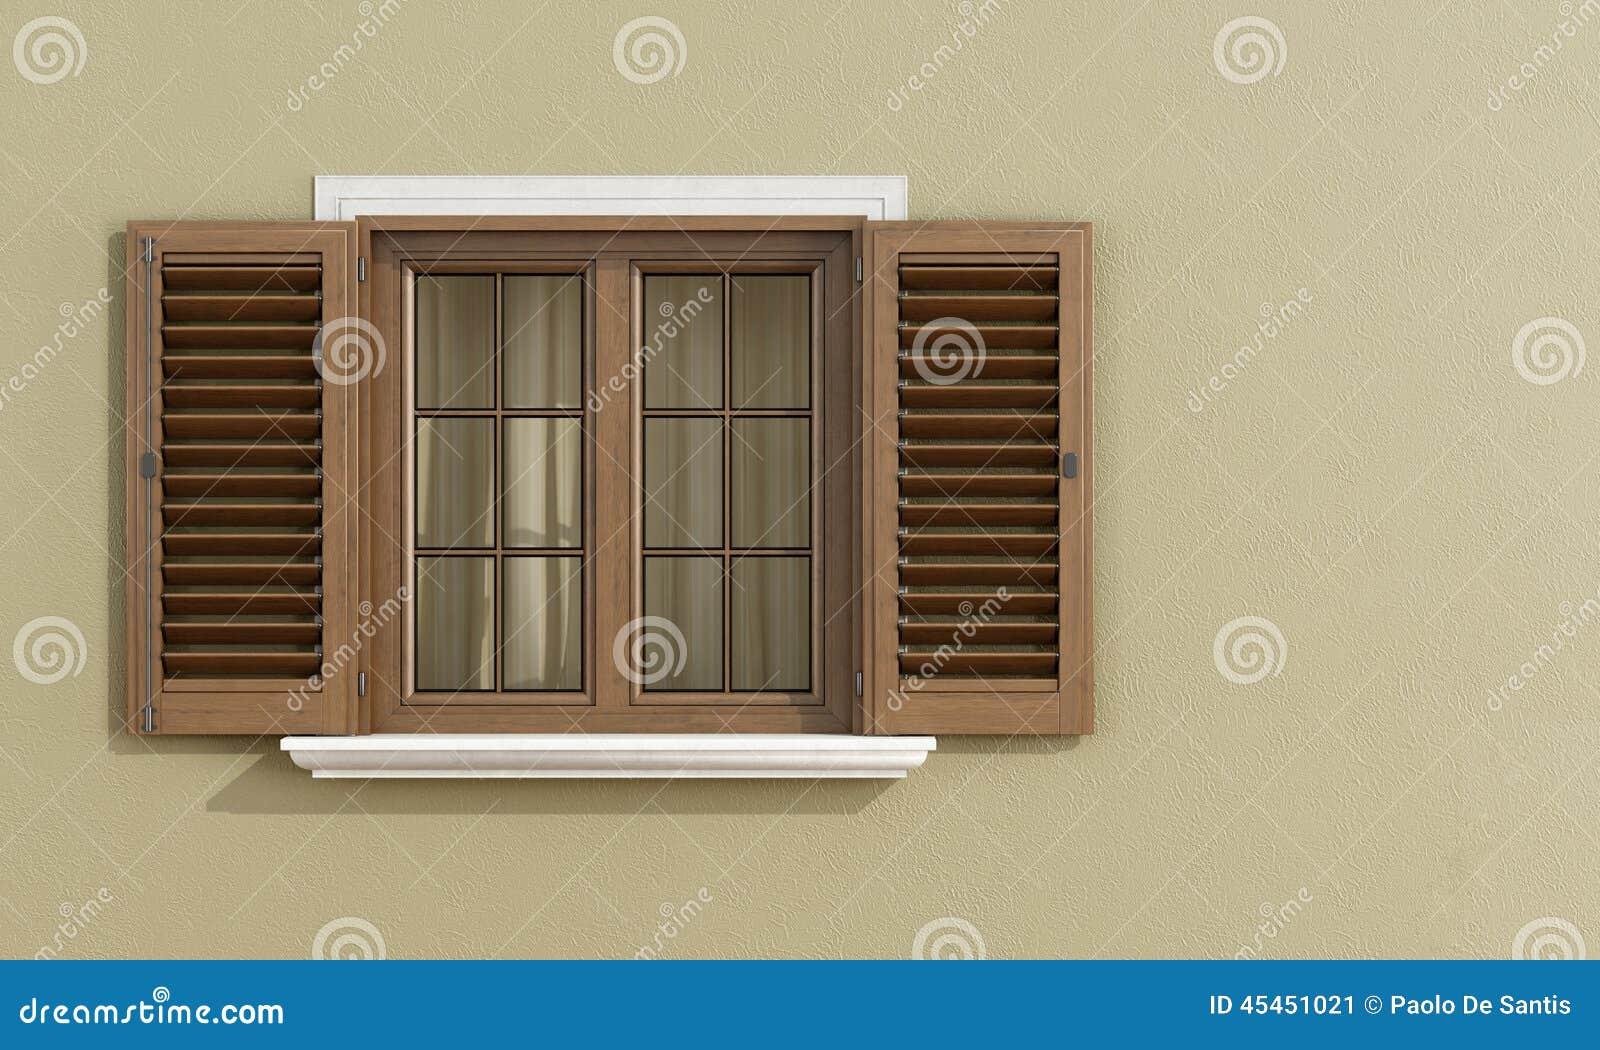 Detalle de una ventana de madera